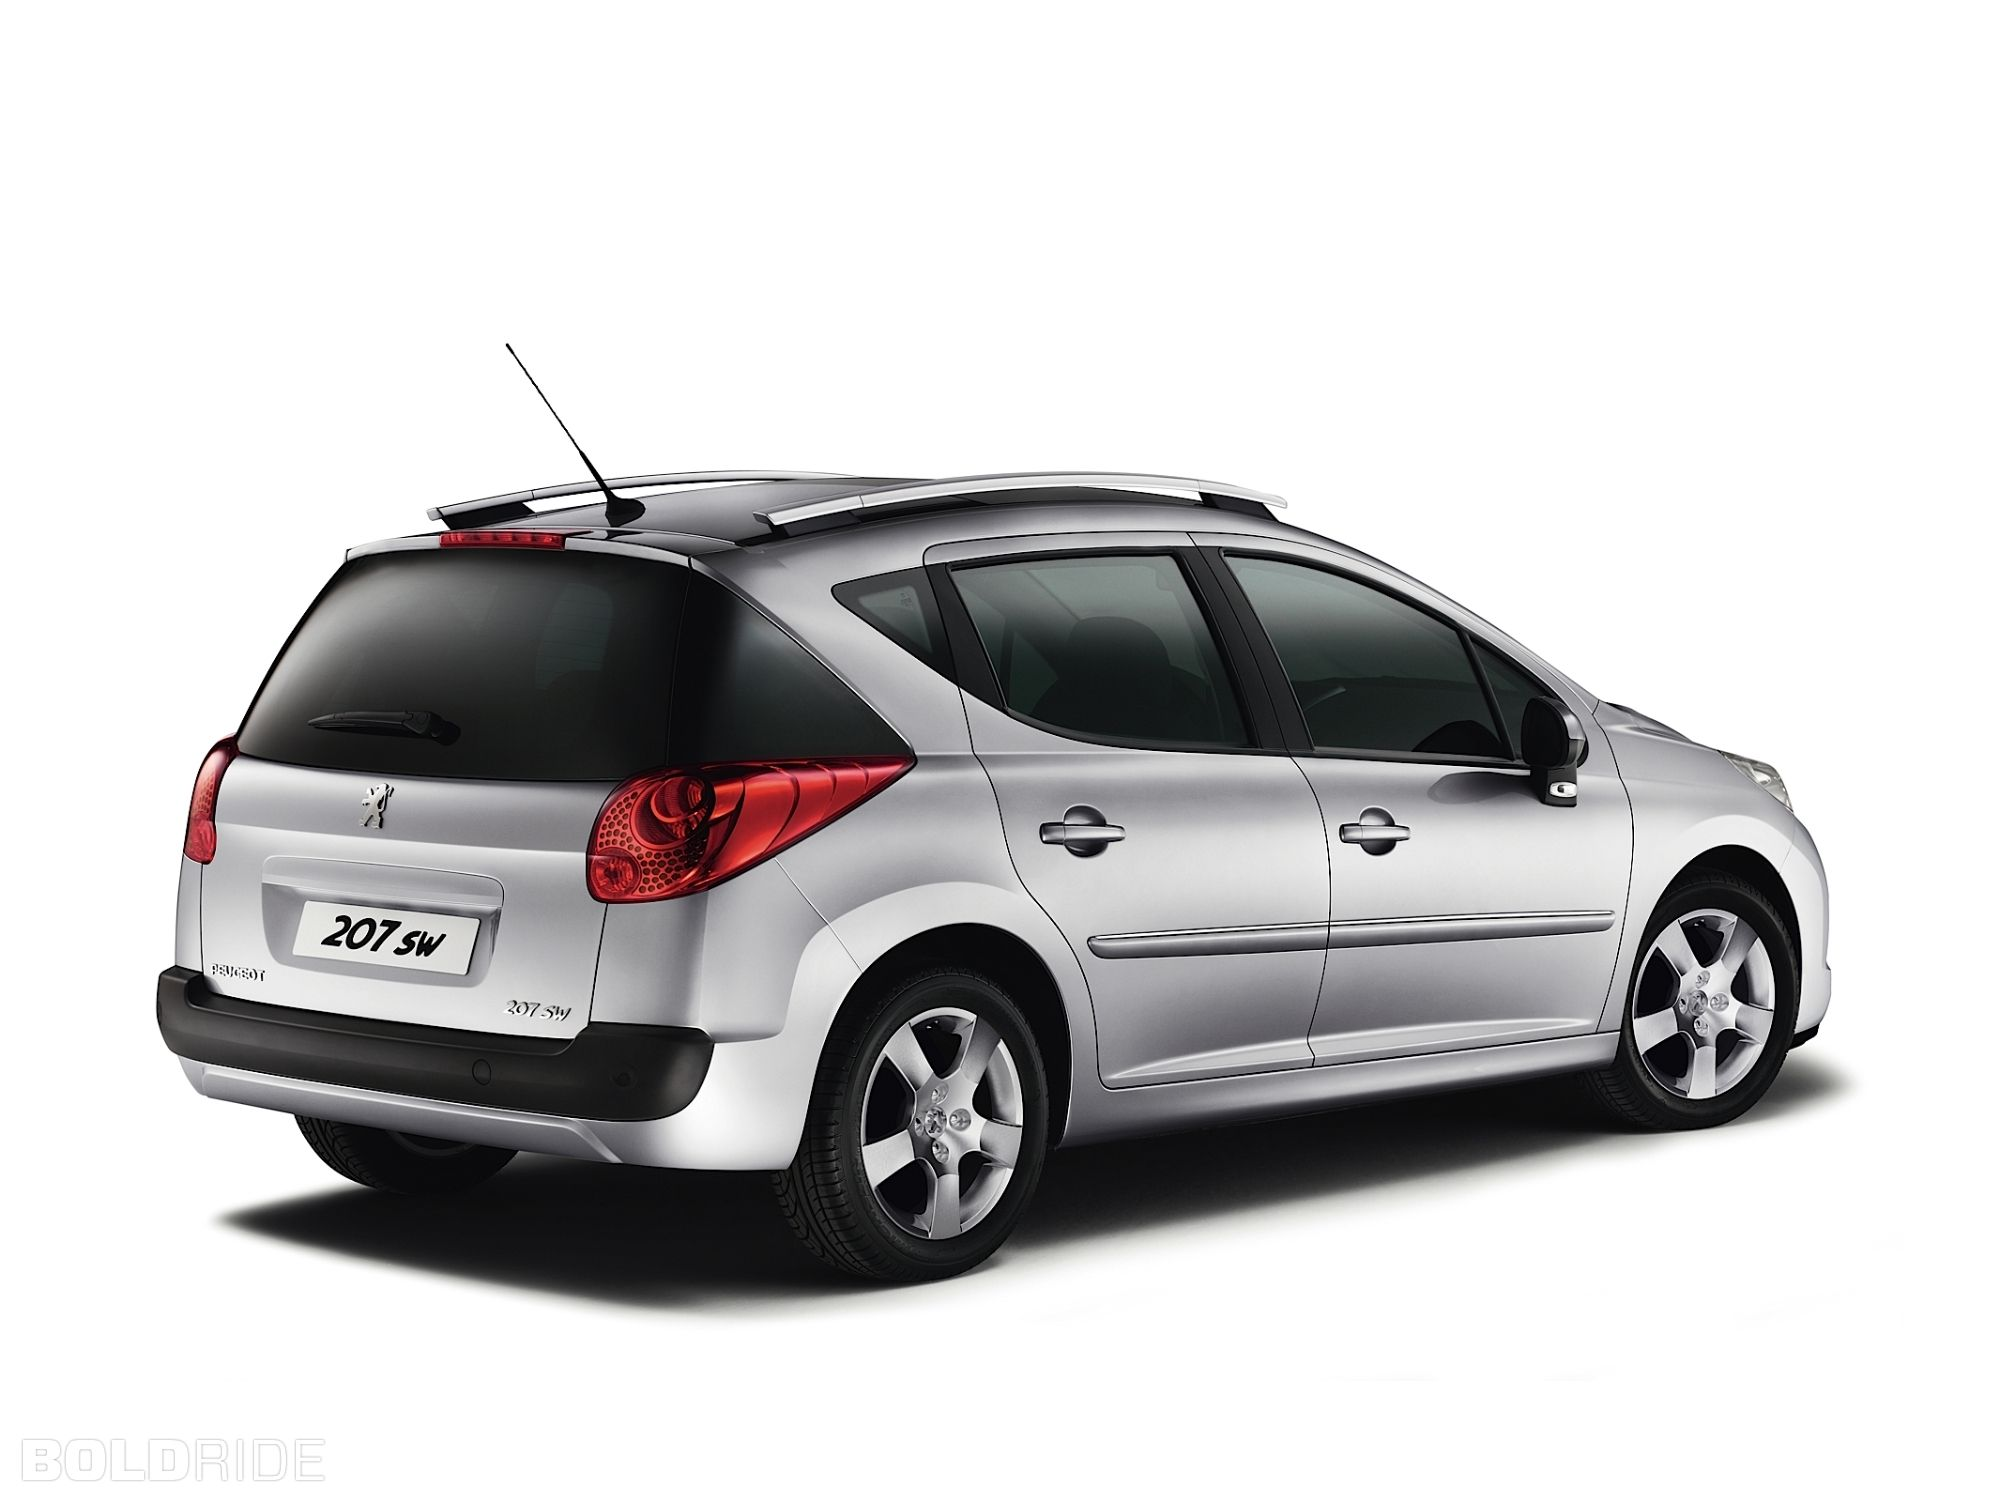 Peugeot 207sw Peugeot Car Suv